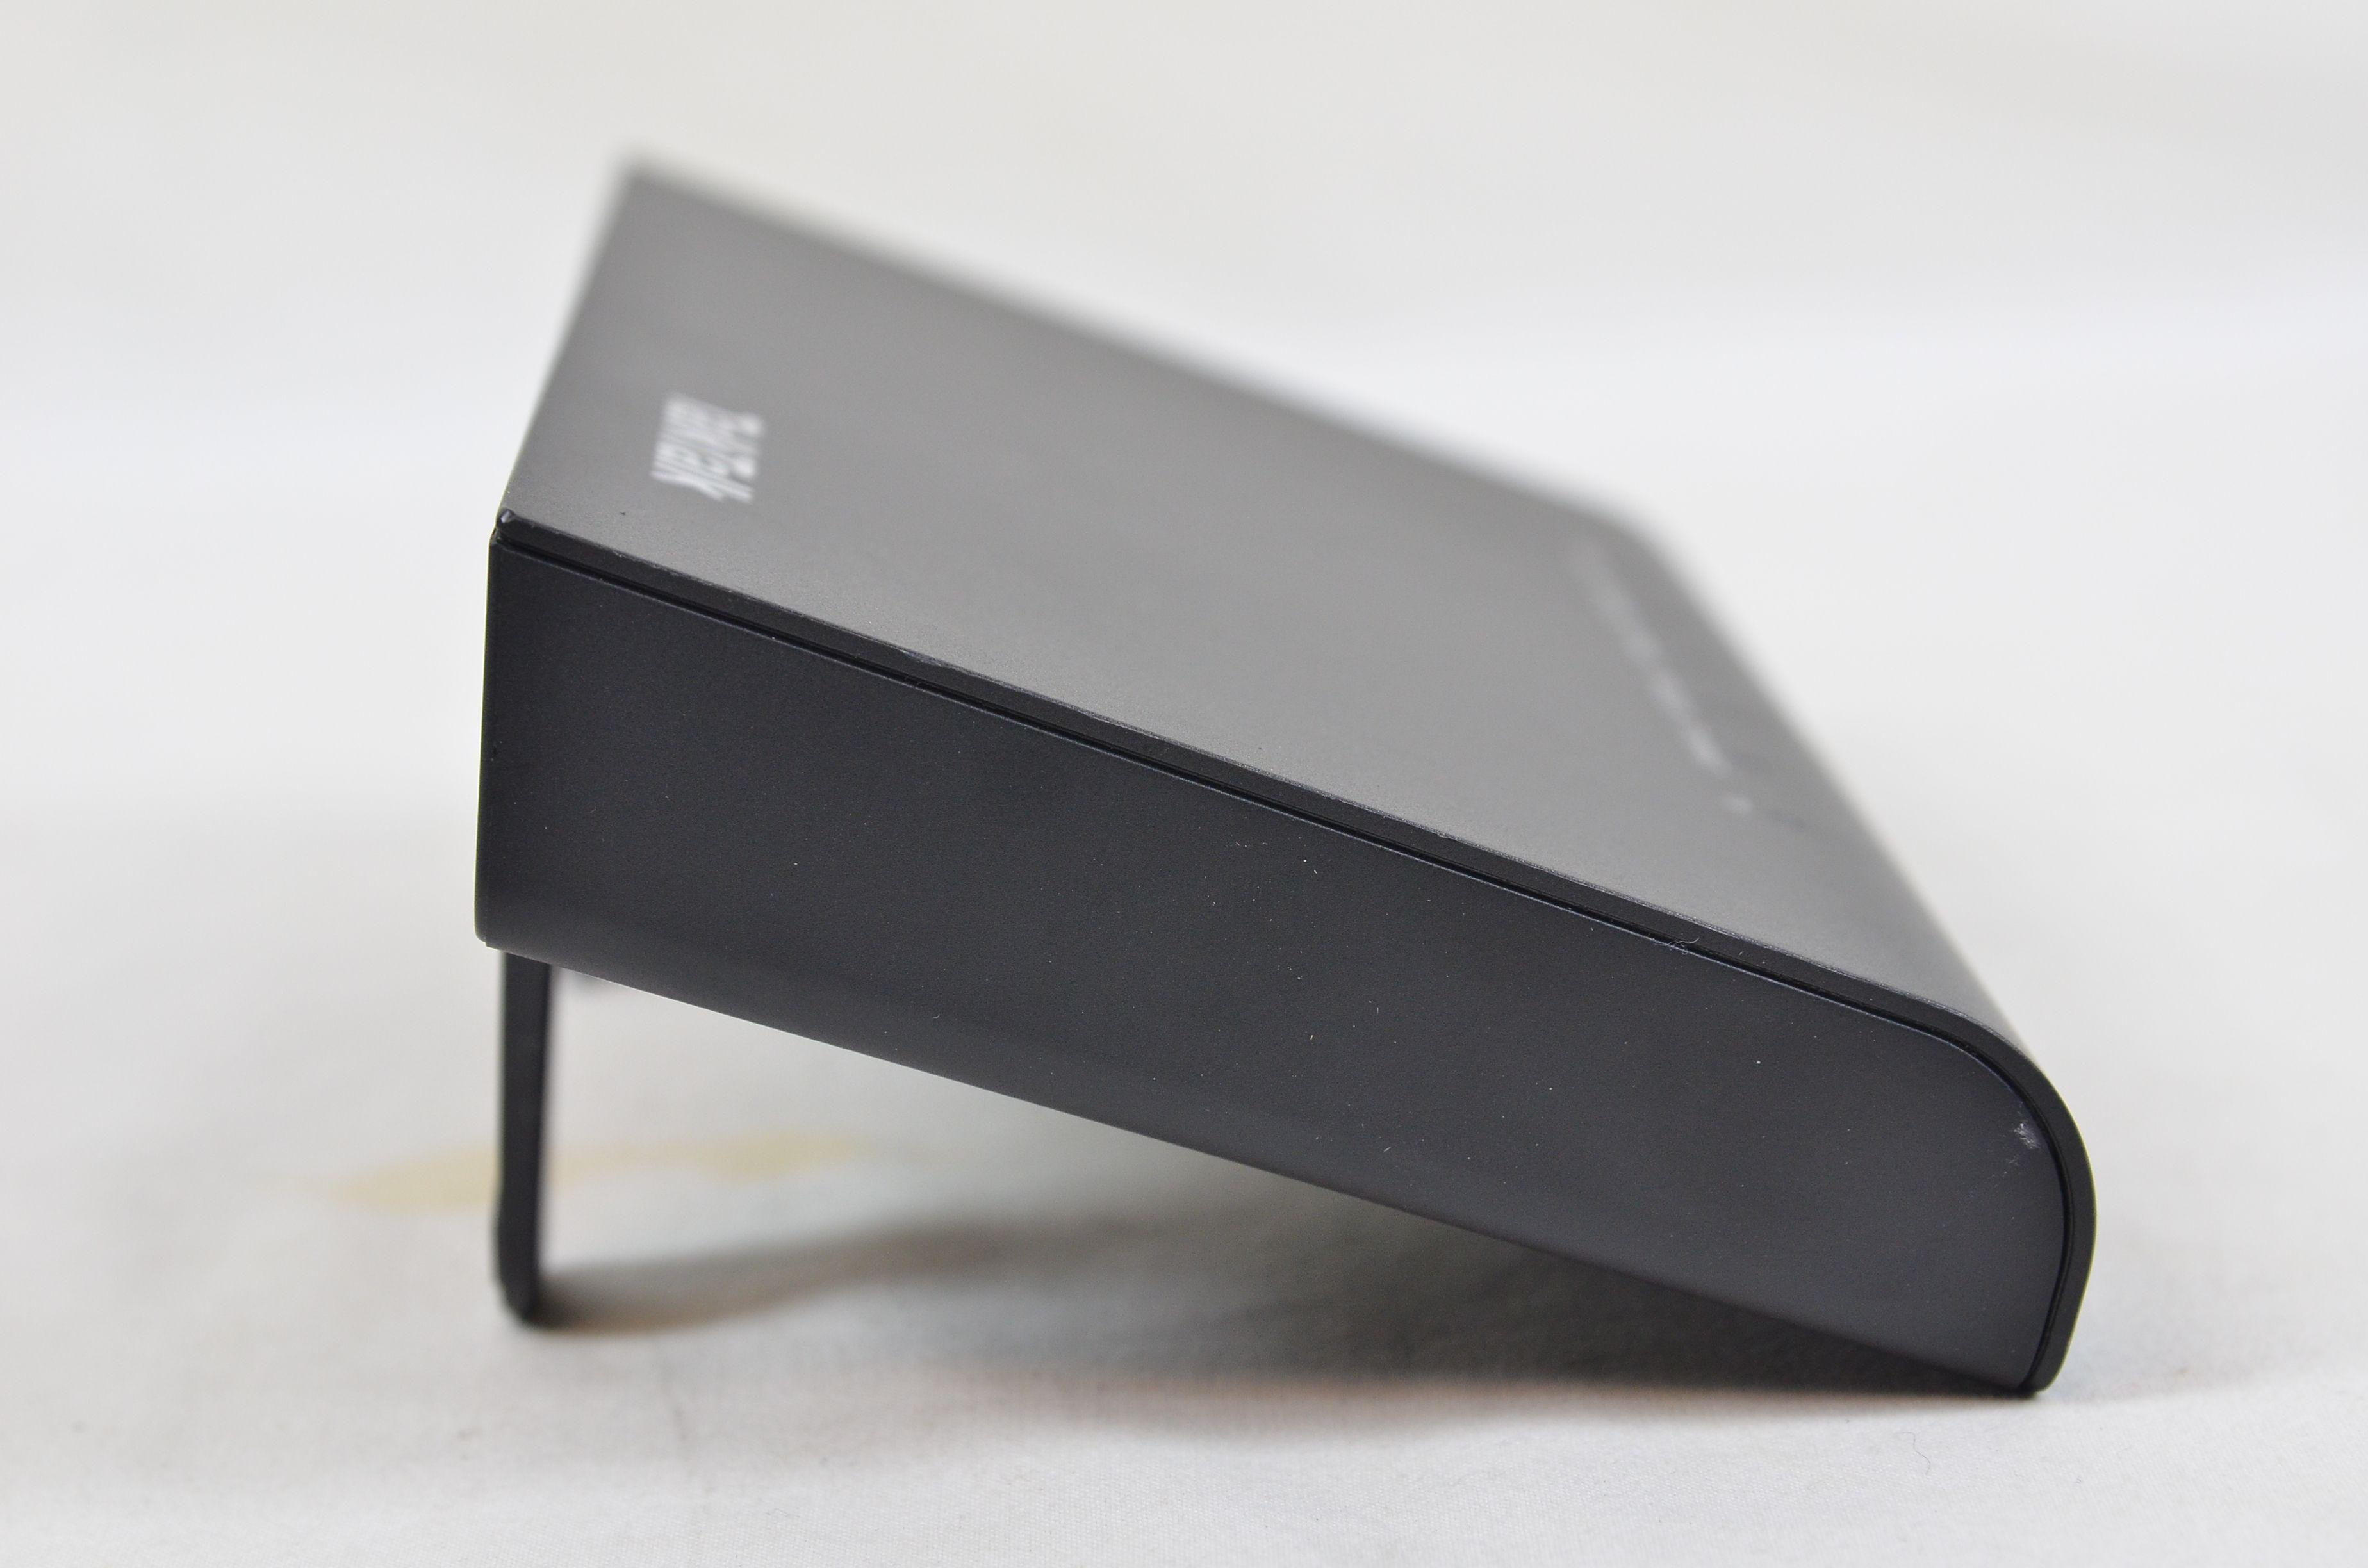 TalkTalk Super Router Huawei HG633 ADSL2+ Broadband Wireless N Modem